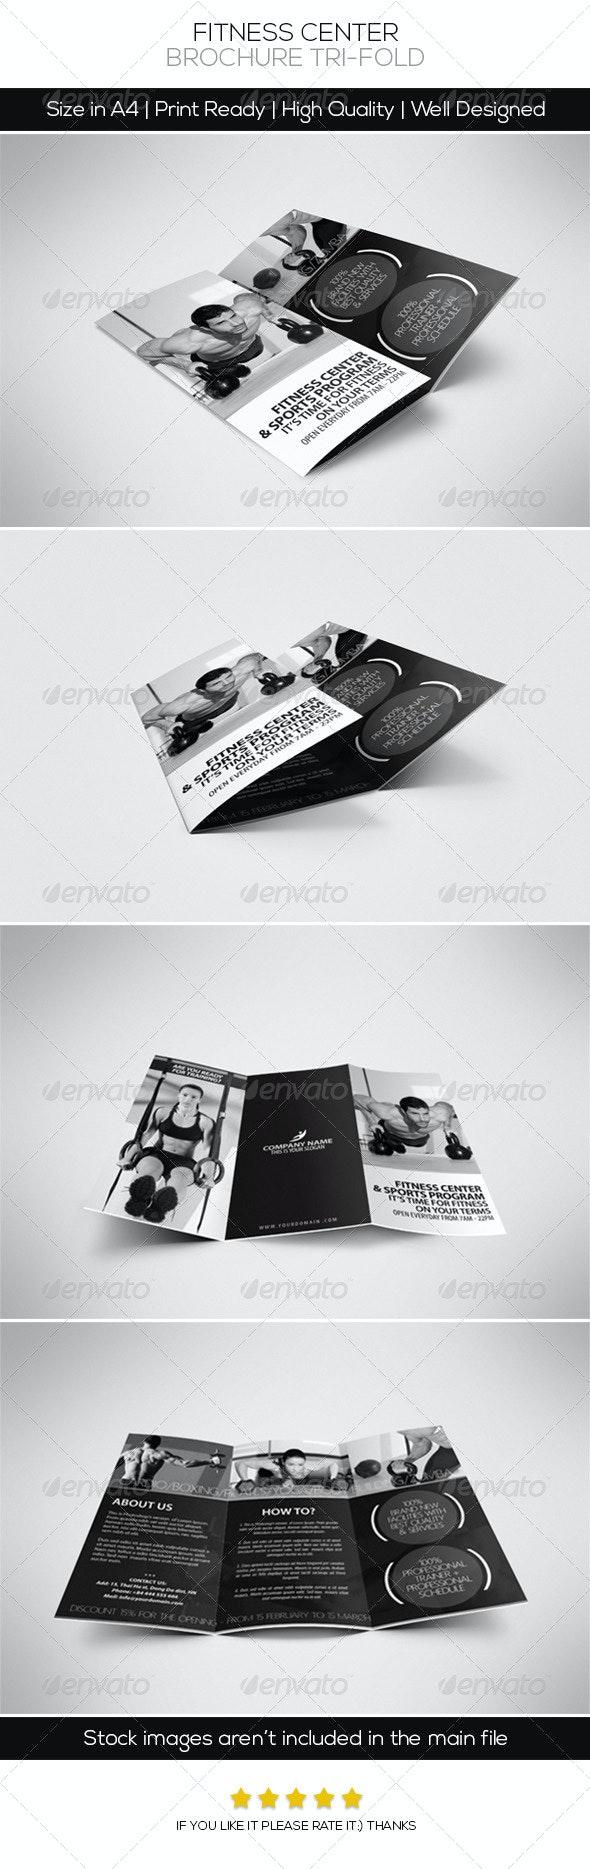 Fitness Center Brochure Tri-fold - Brochures Print Templates